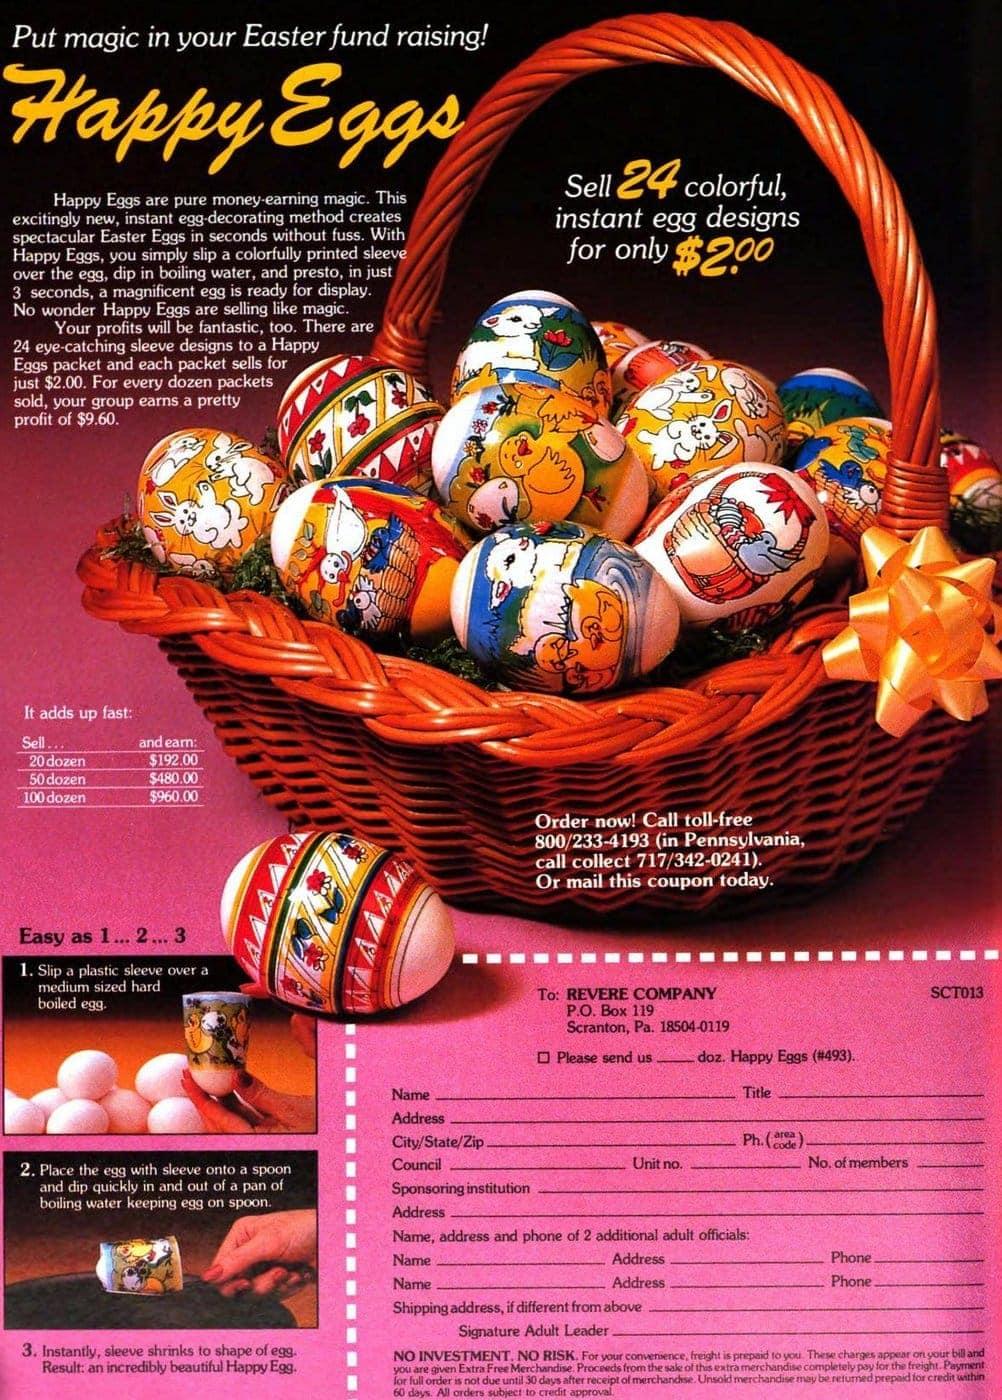 Vintage 1983 Happy Eggs - decorating shrink plastic sleeves